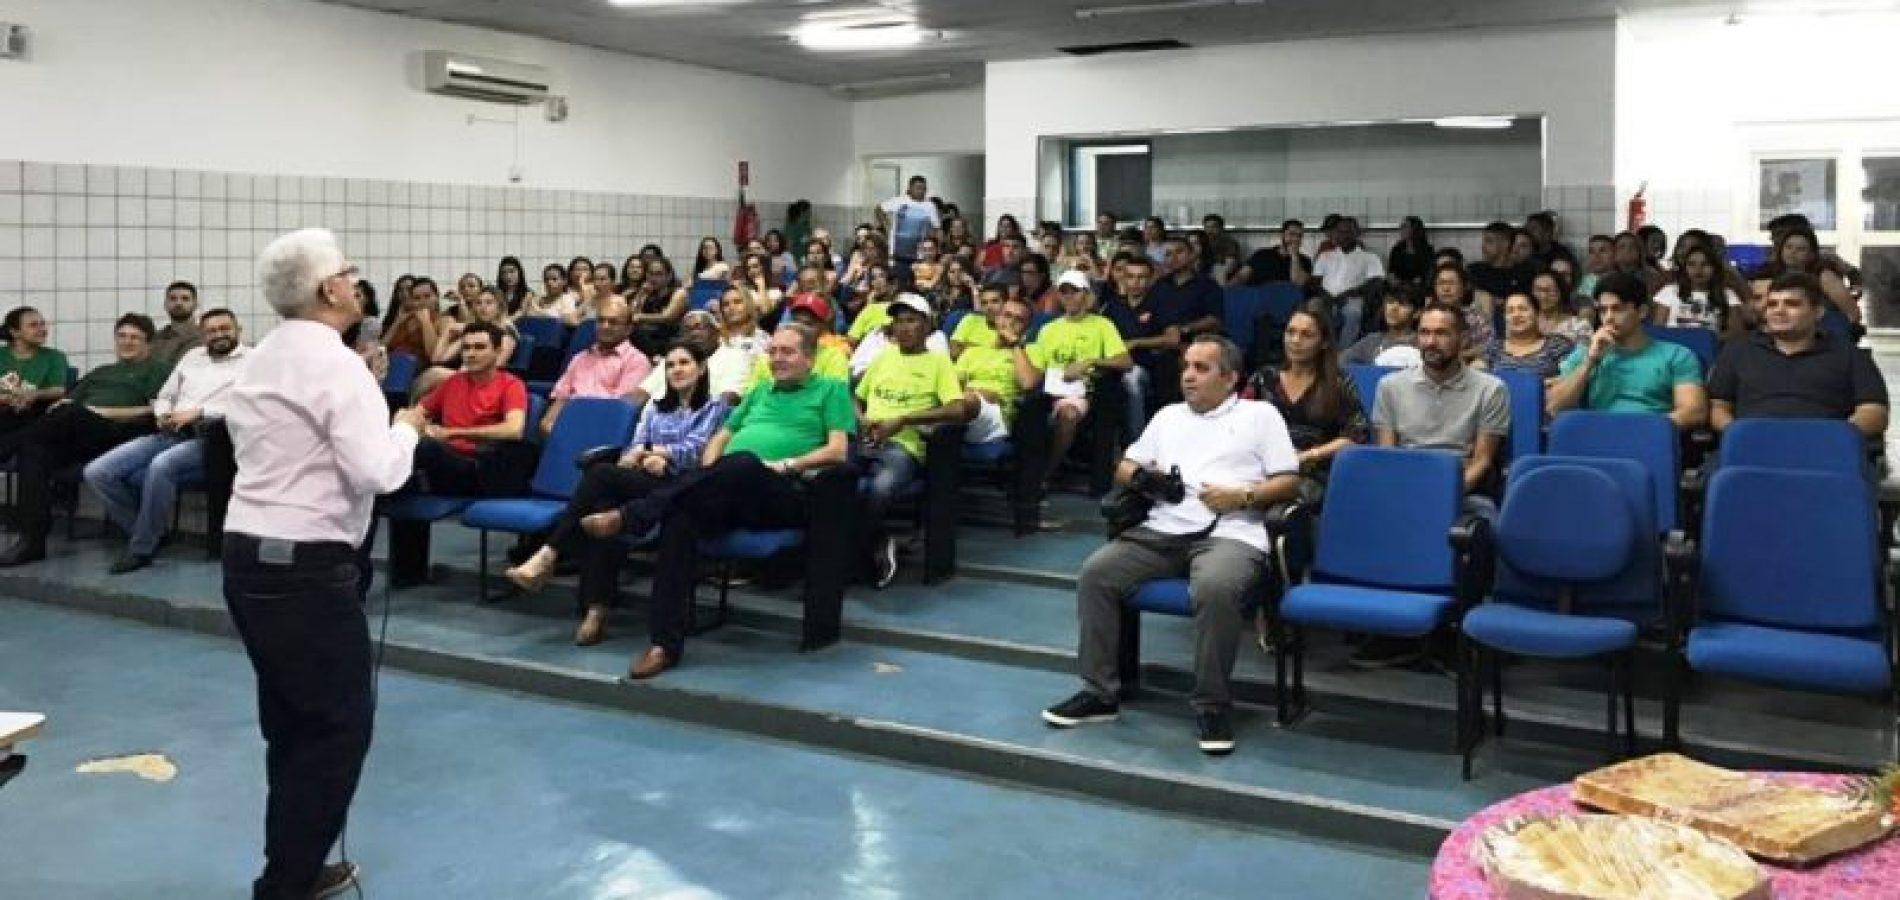 Saúde De Picos Realiza Palestra Motivacional Para